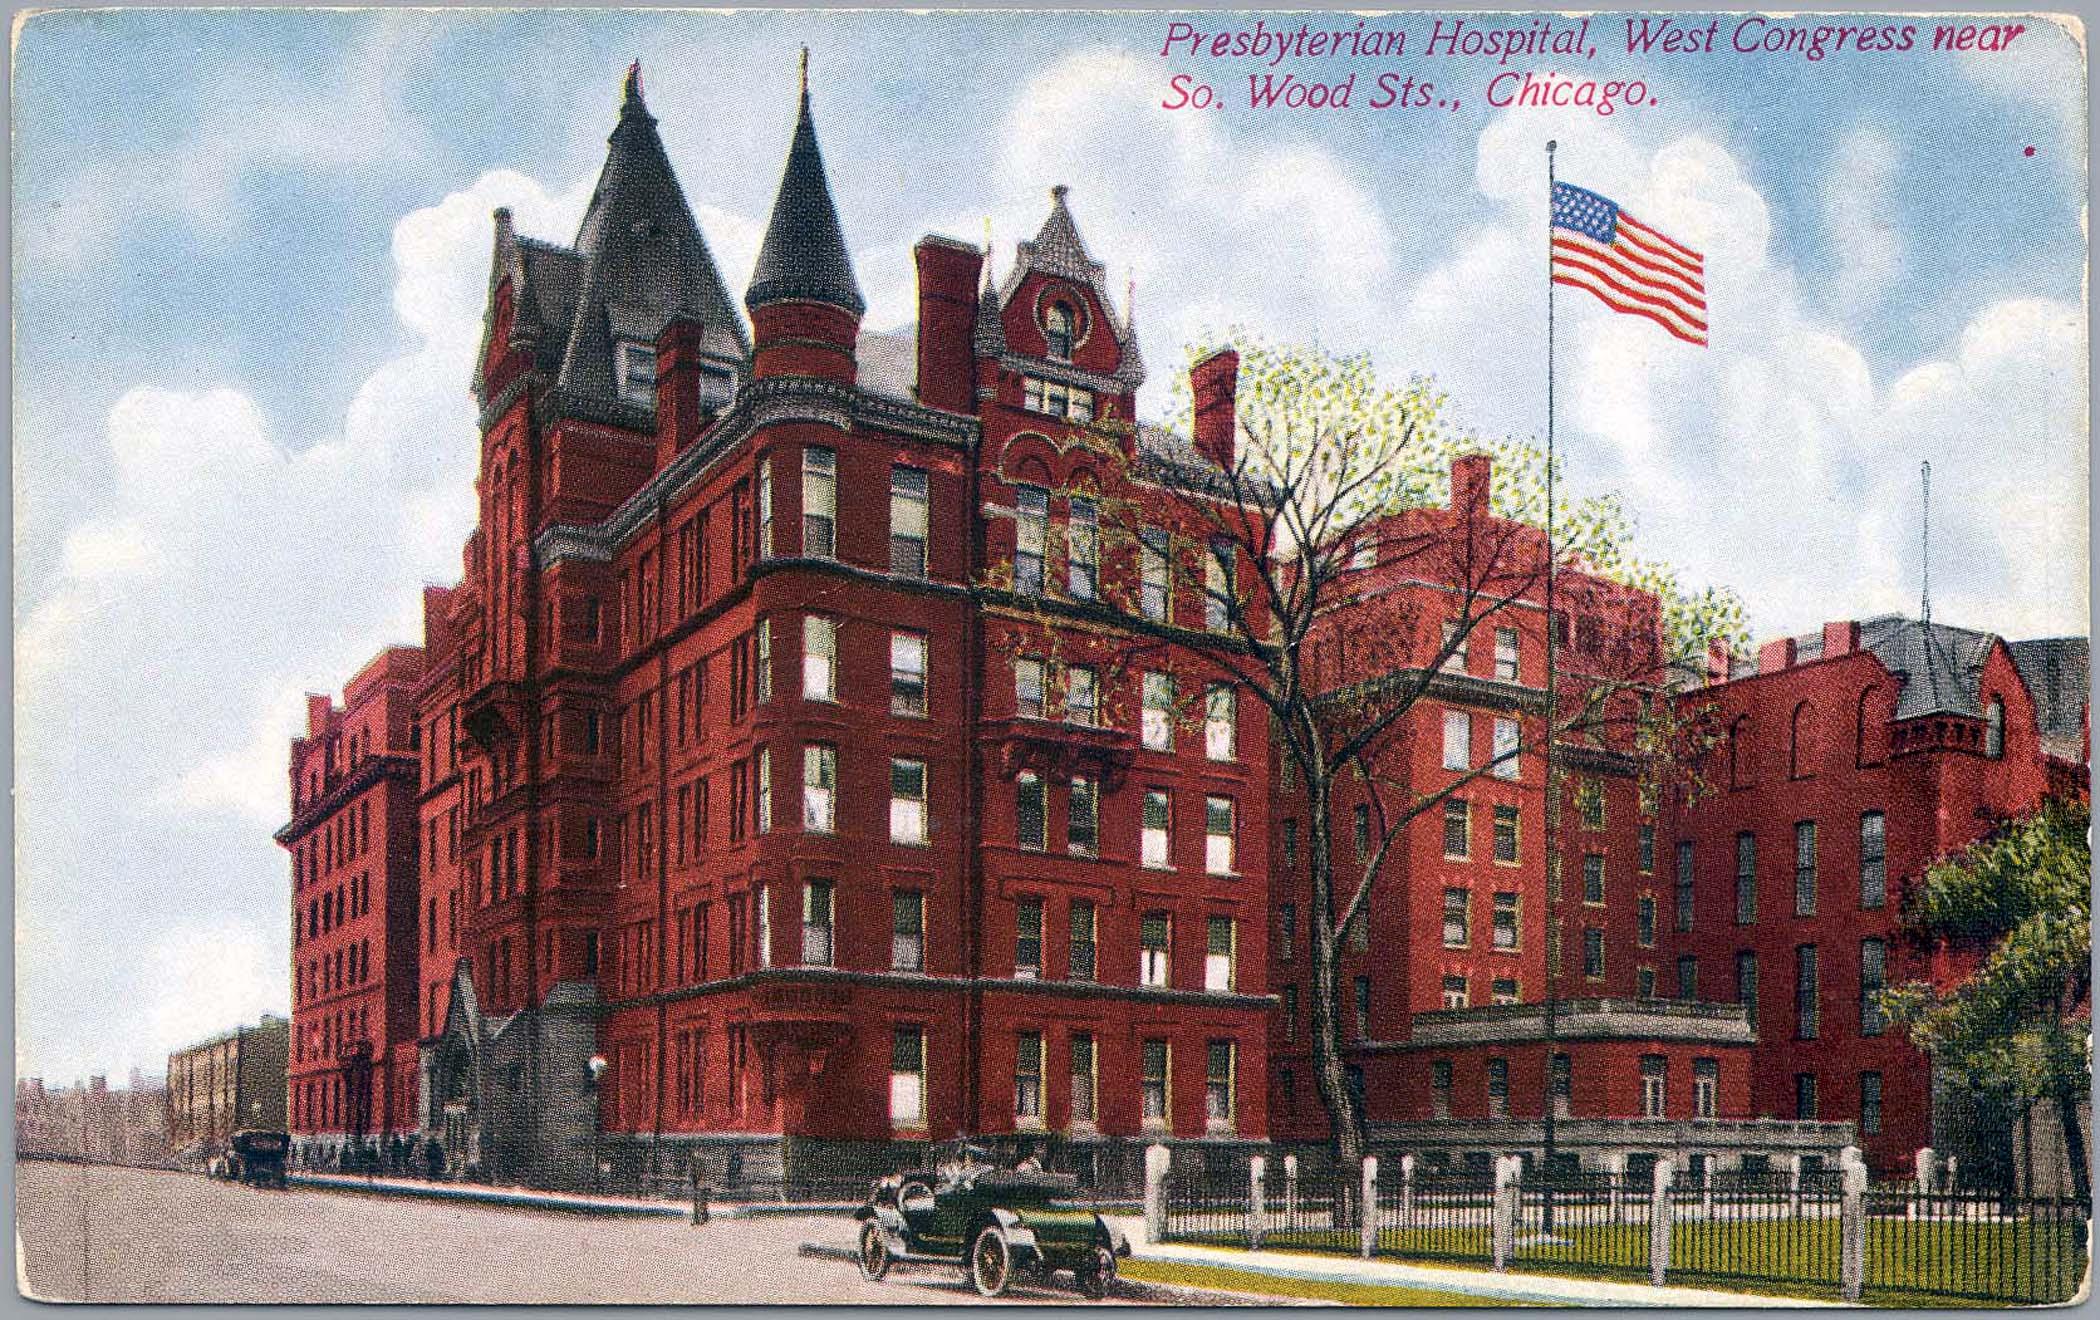 Postcard image of the Jones Building, corner of Congress and Wood, circa 1915